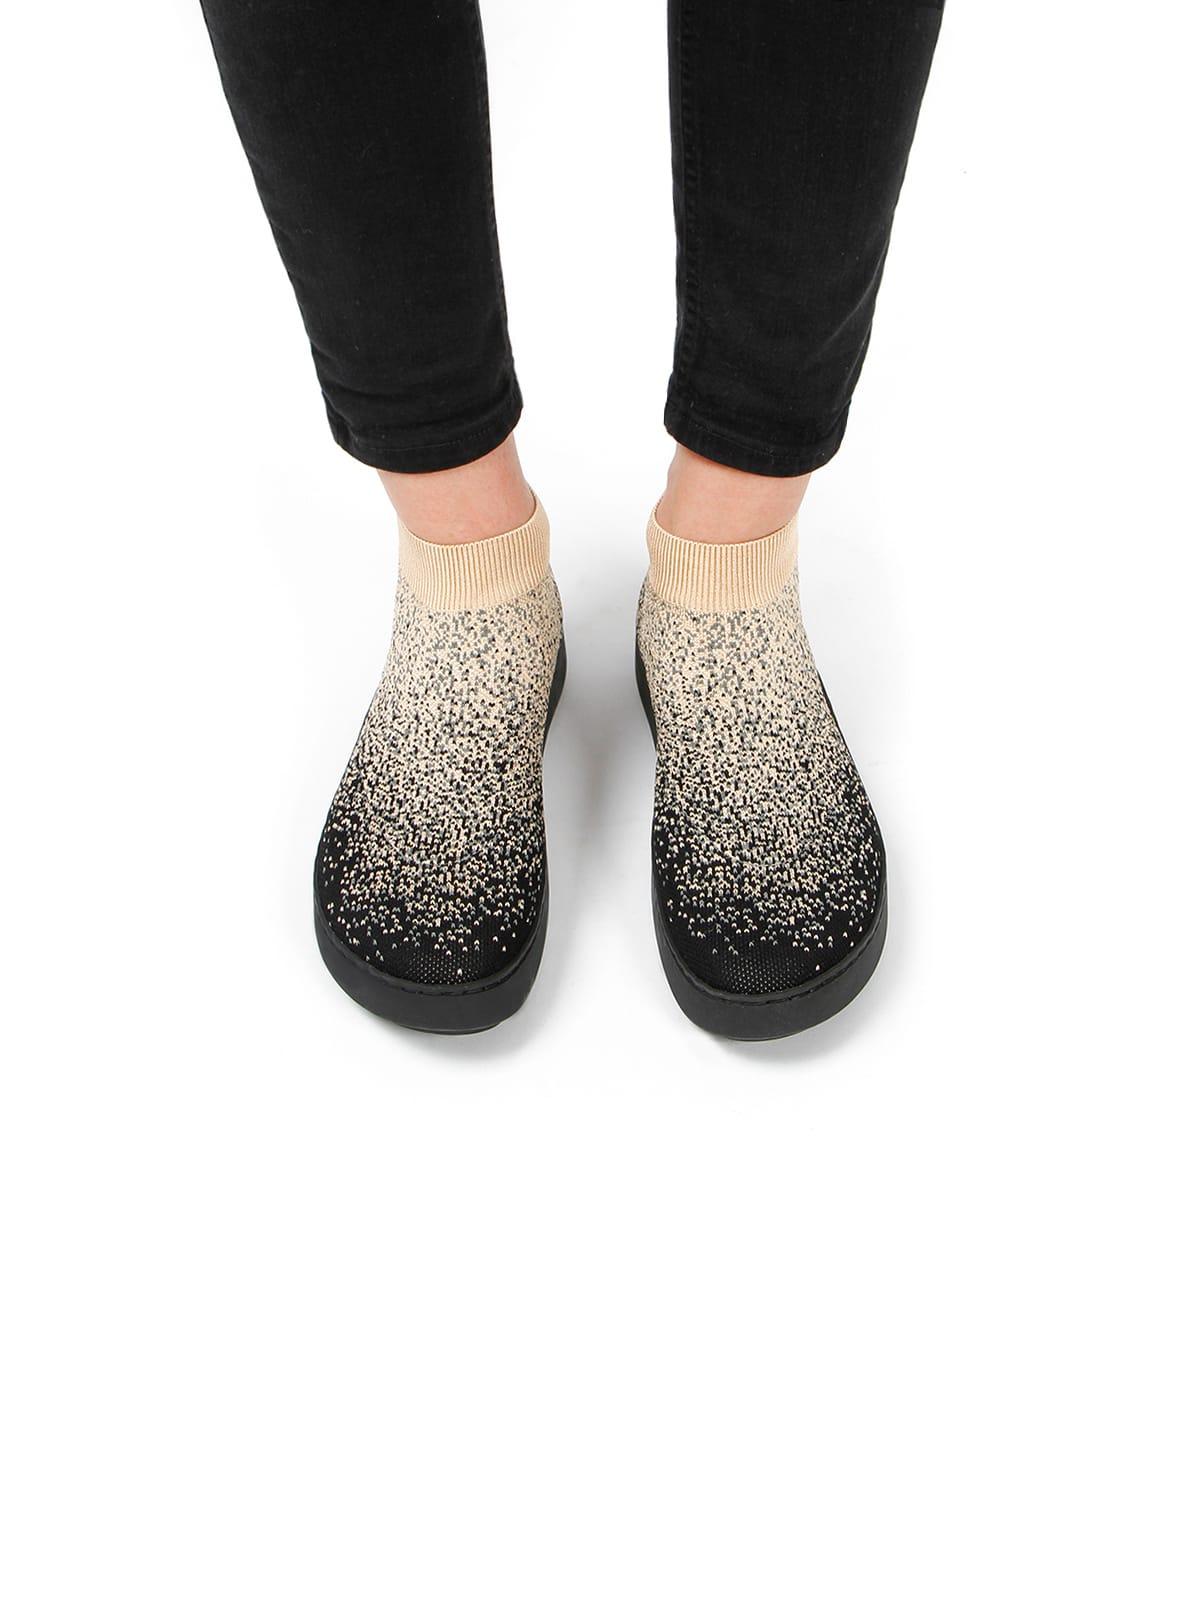 3D knitted sockboot Spexx Starry vorne K